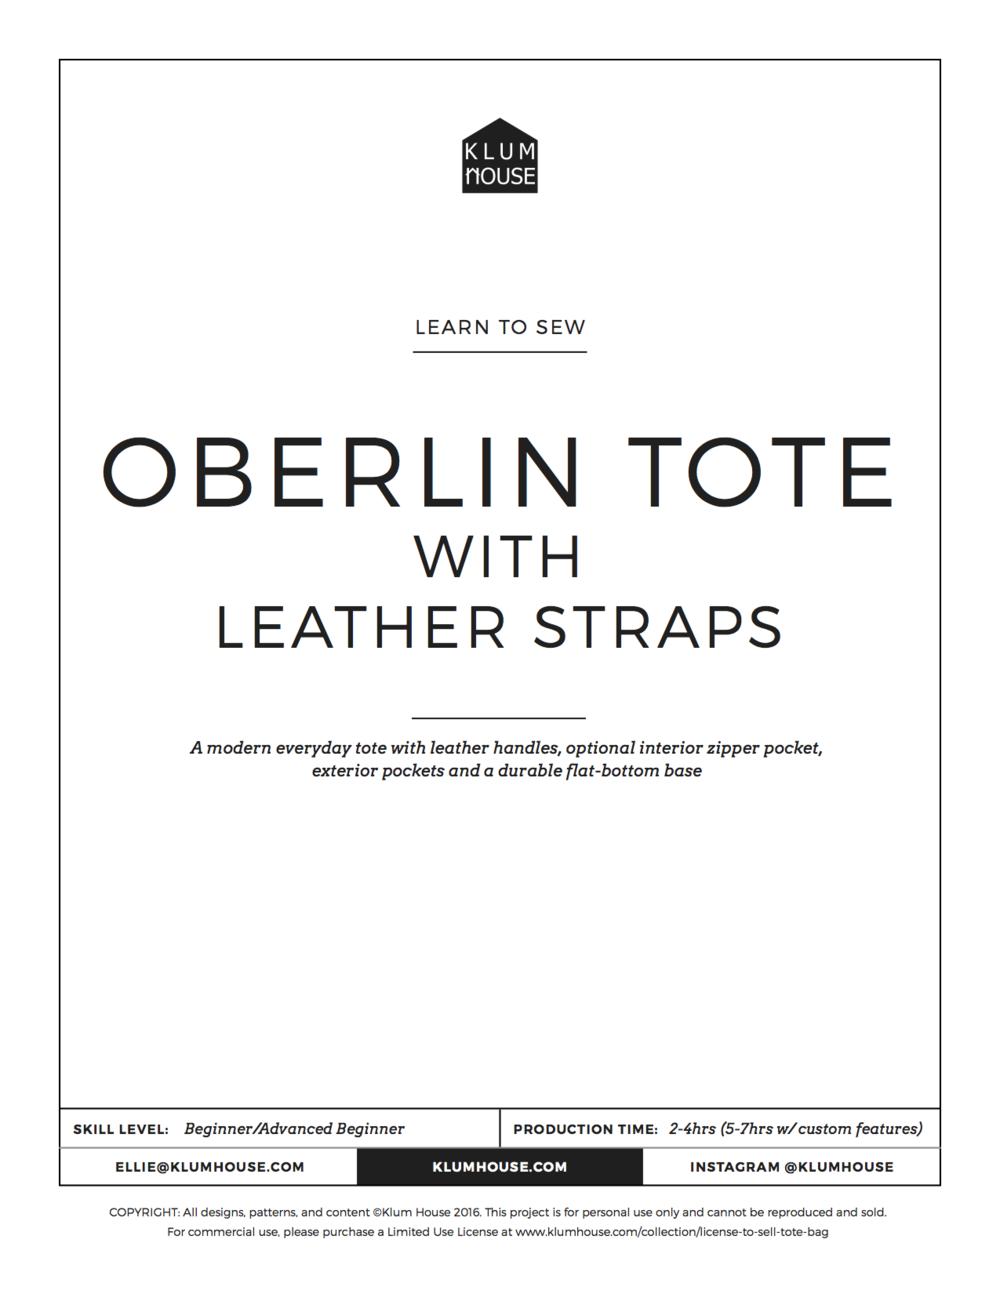 oberlin-tote-pattern